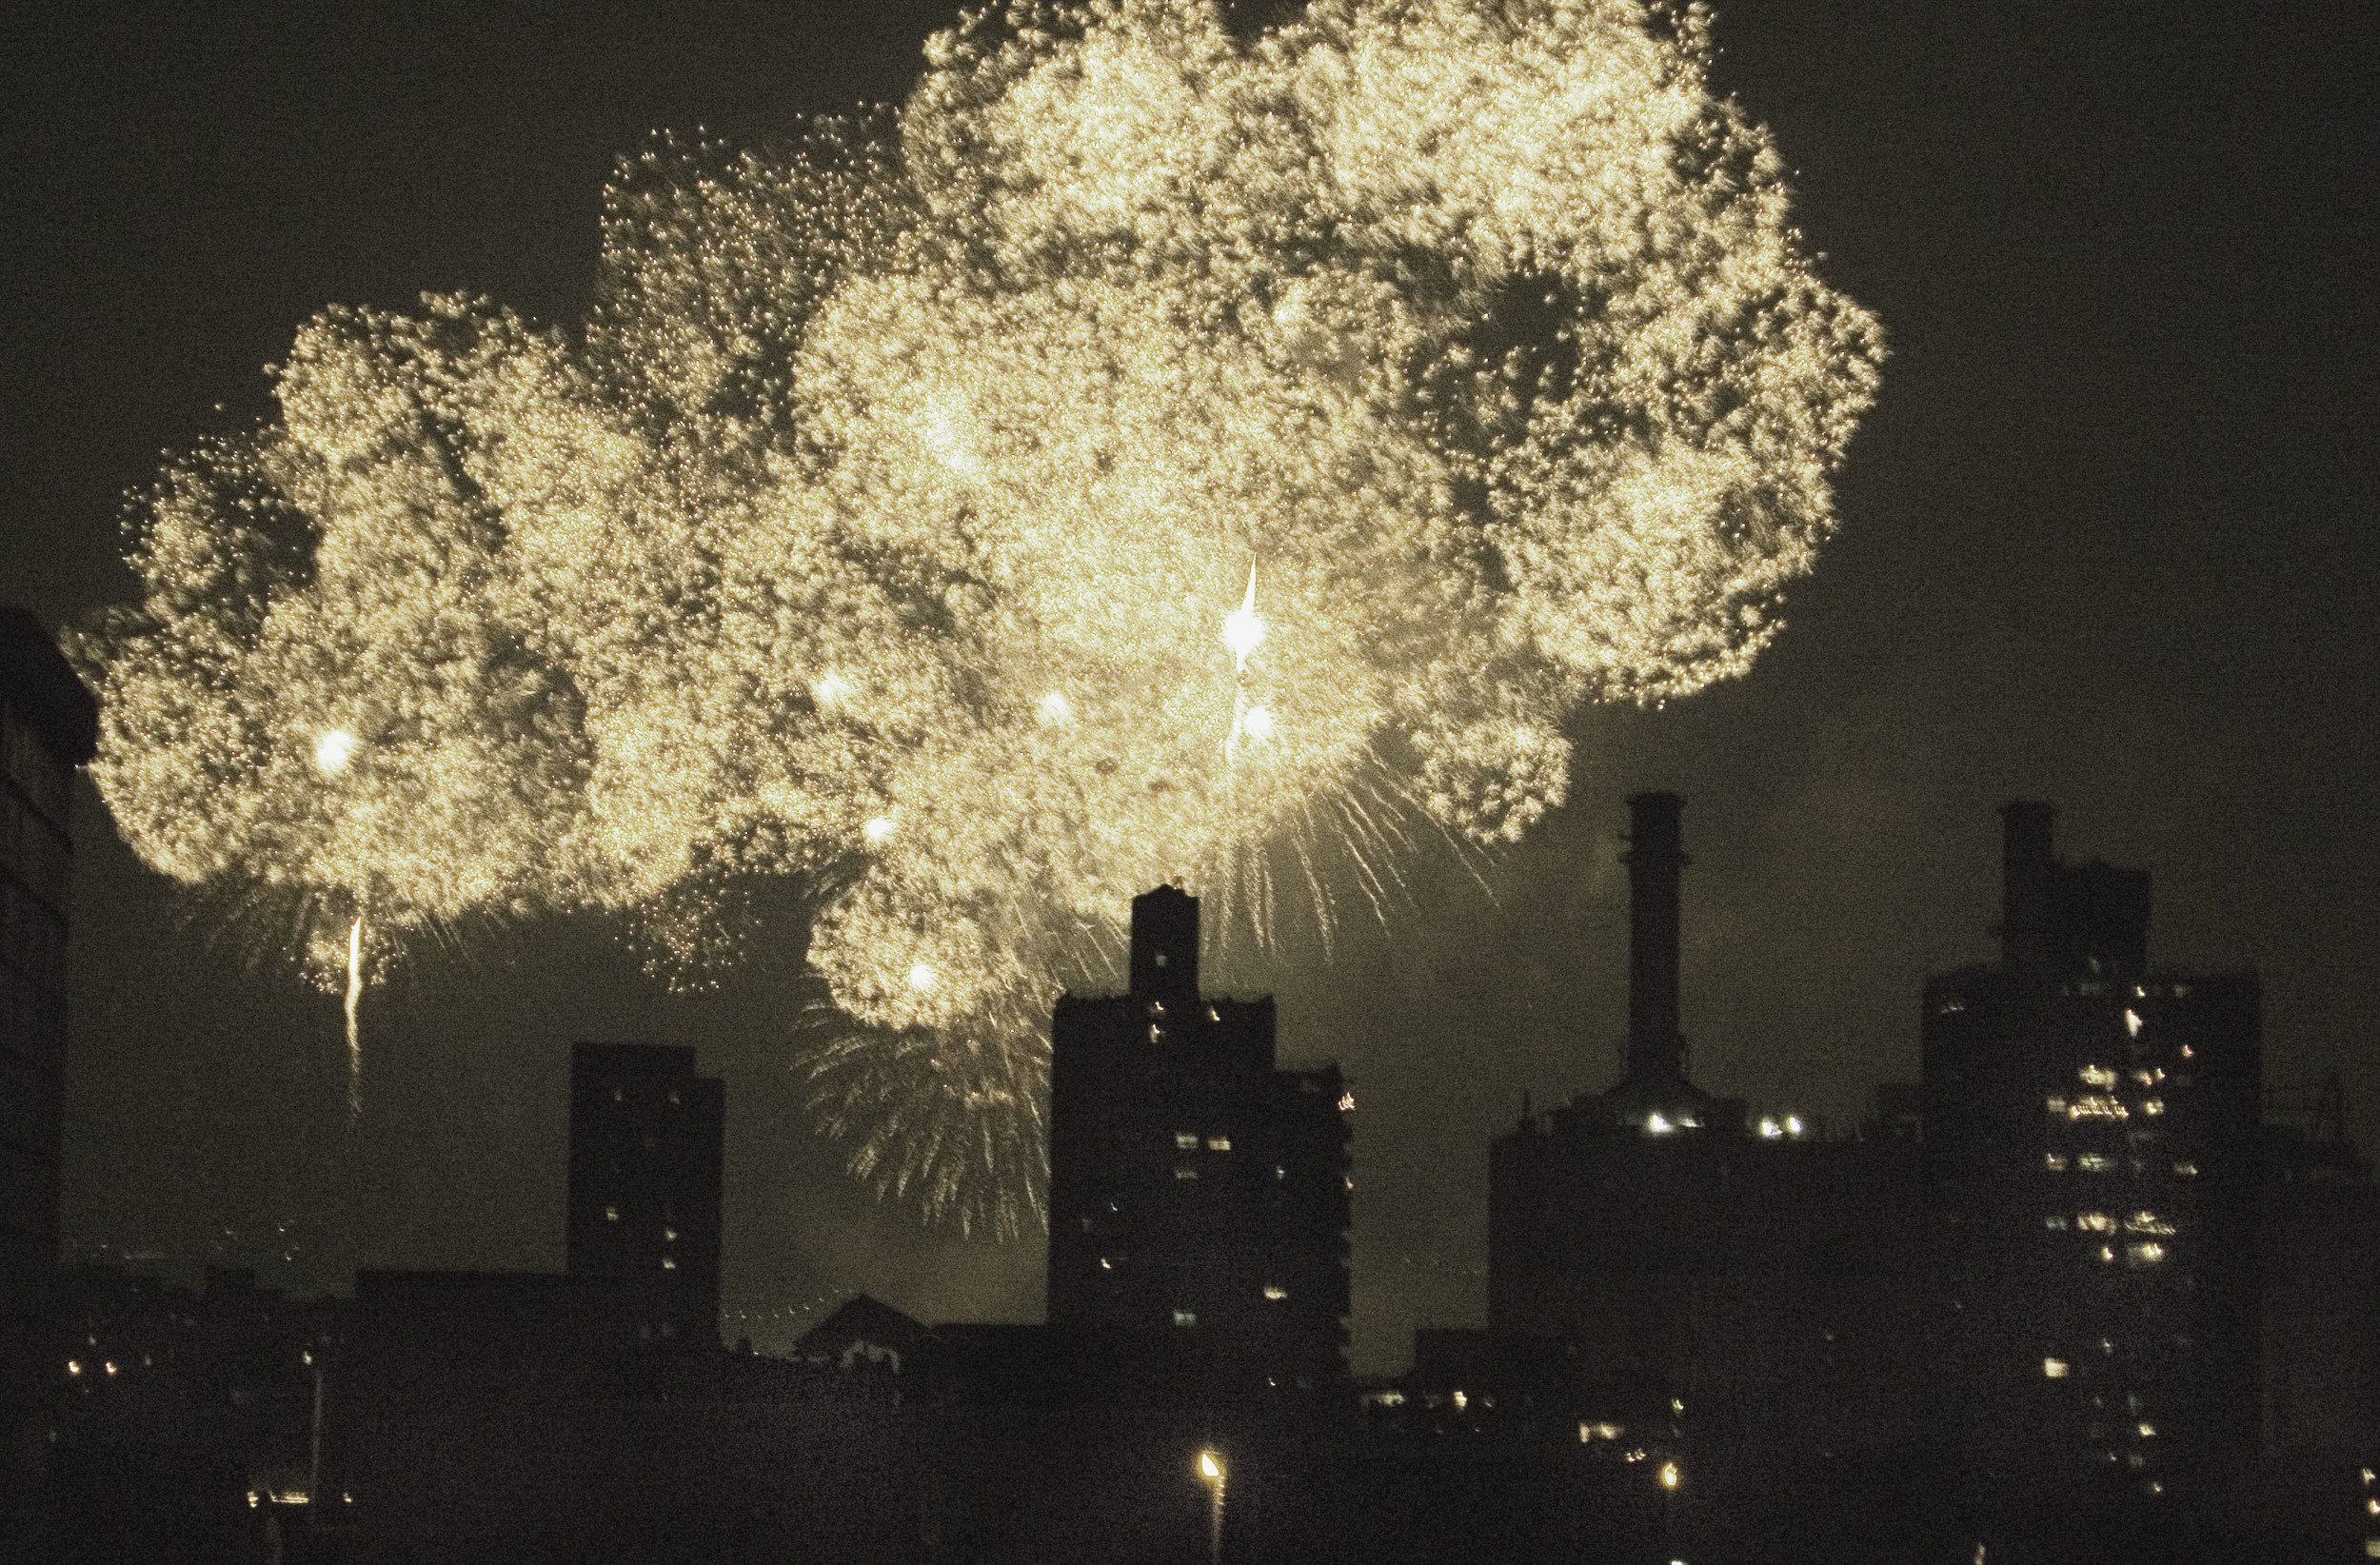 Fireworks_060704_035.jpg